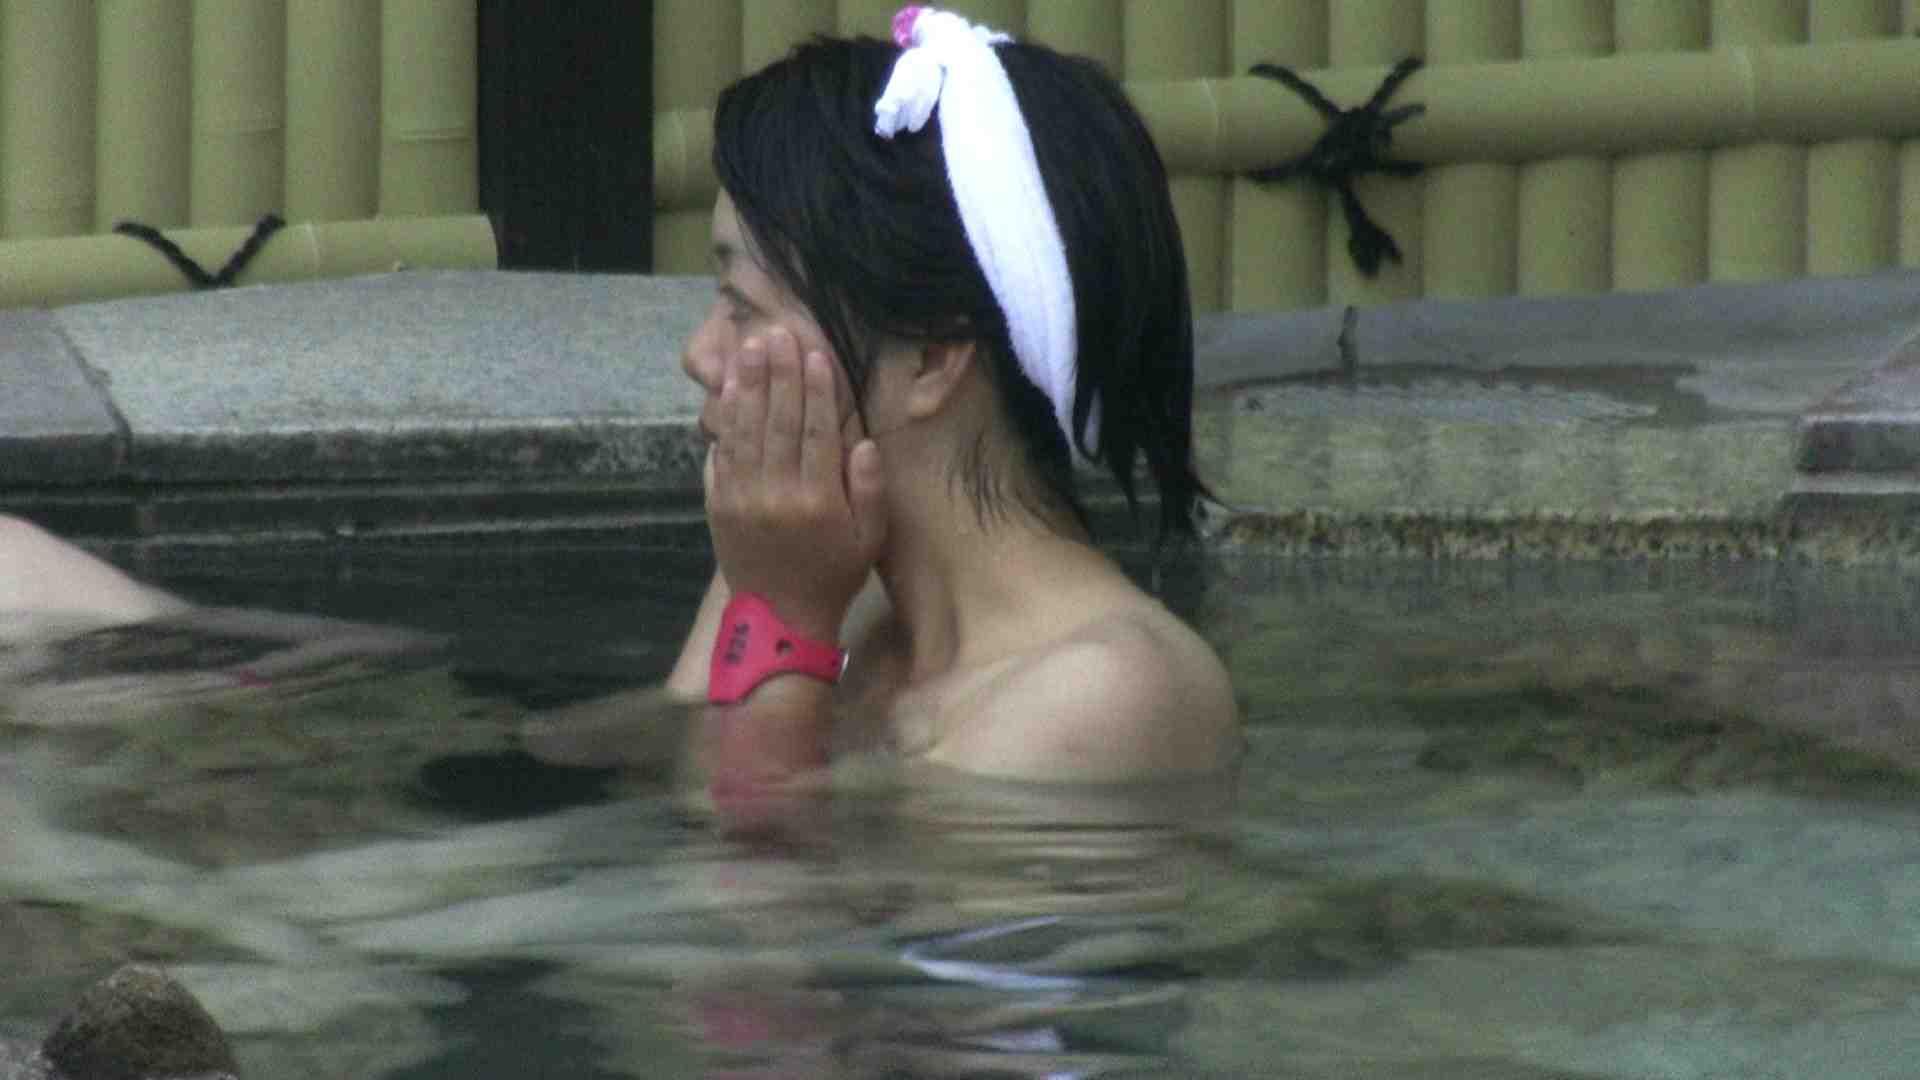 Aquaな露天風呂Vol.179 OLのエロ生活 | 露天風呂  105連発 103